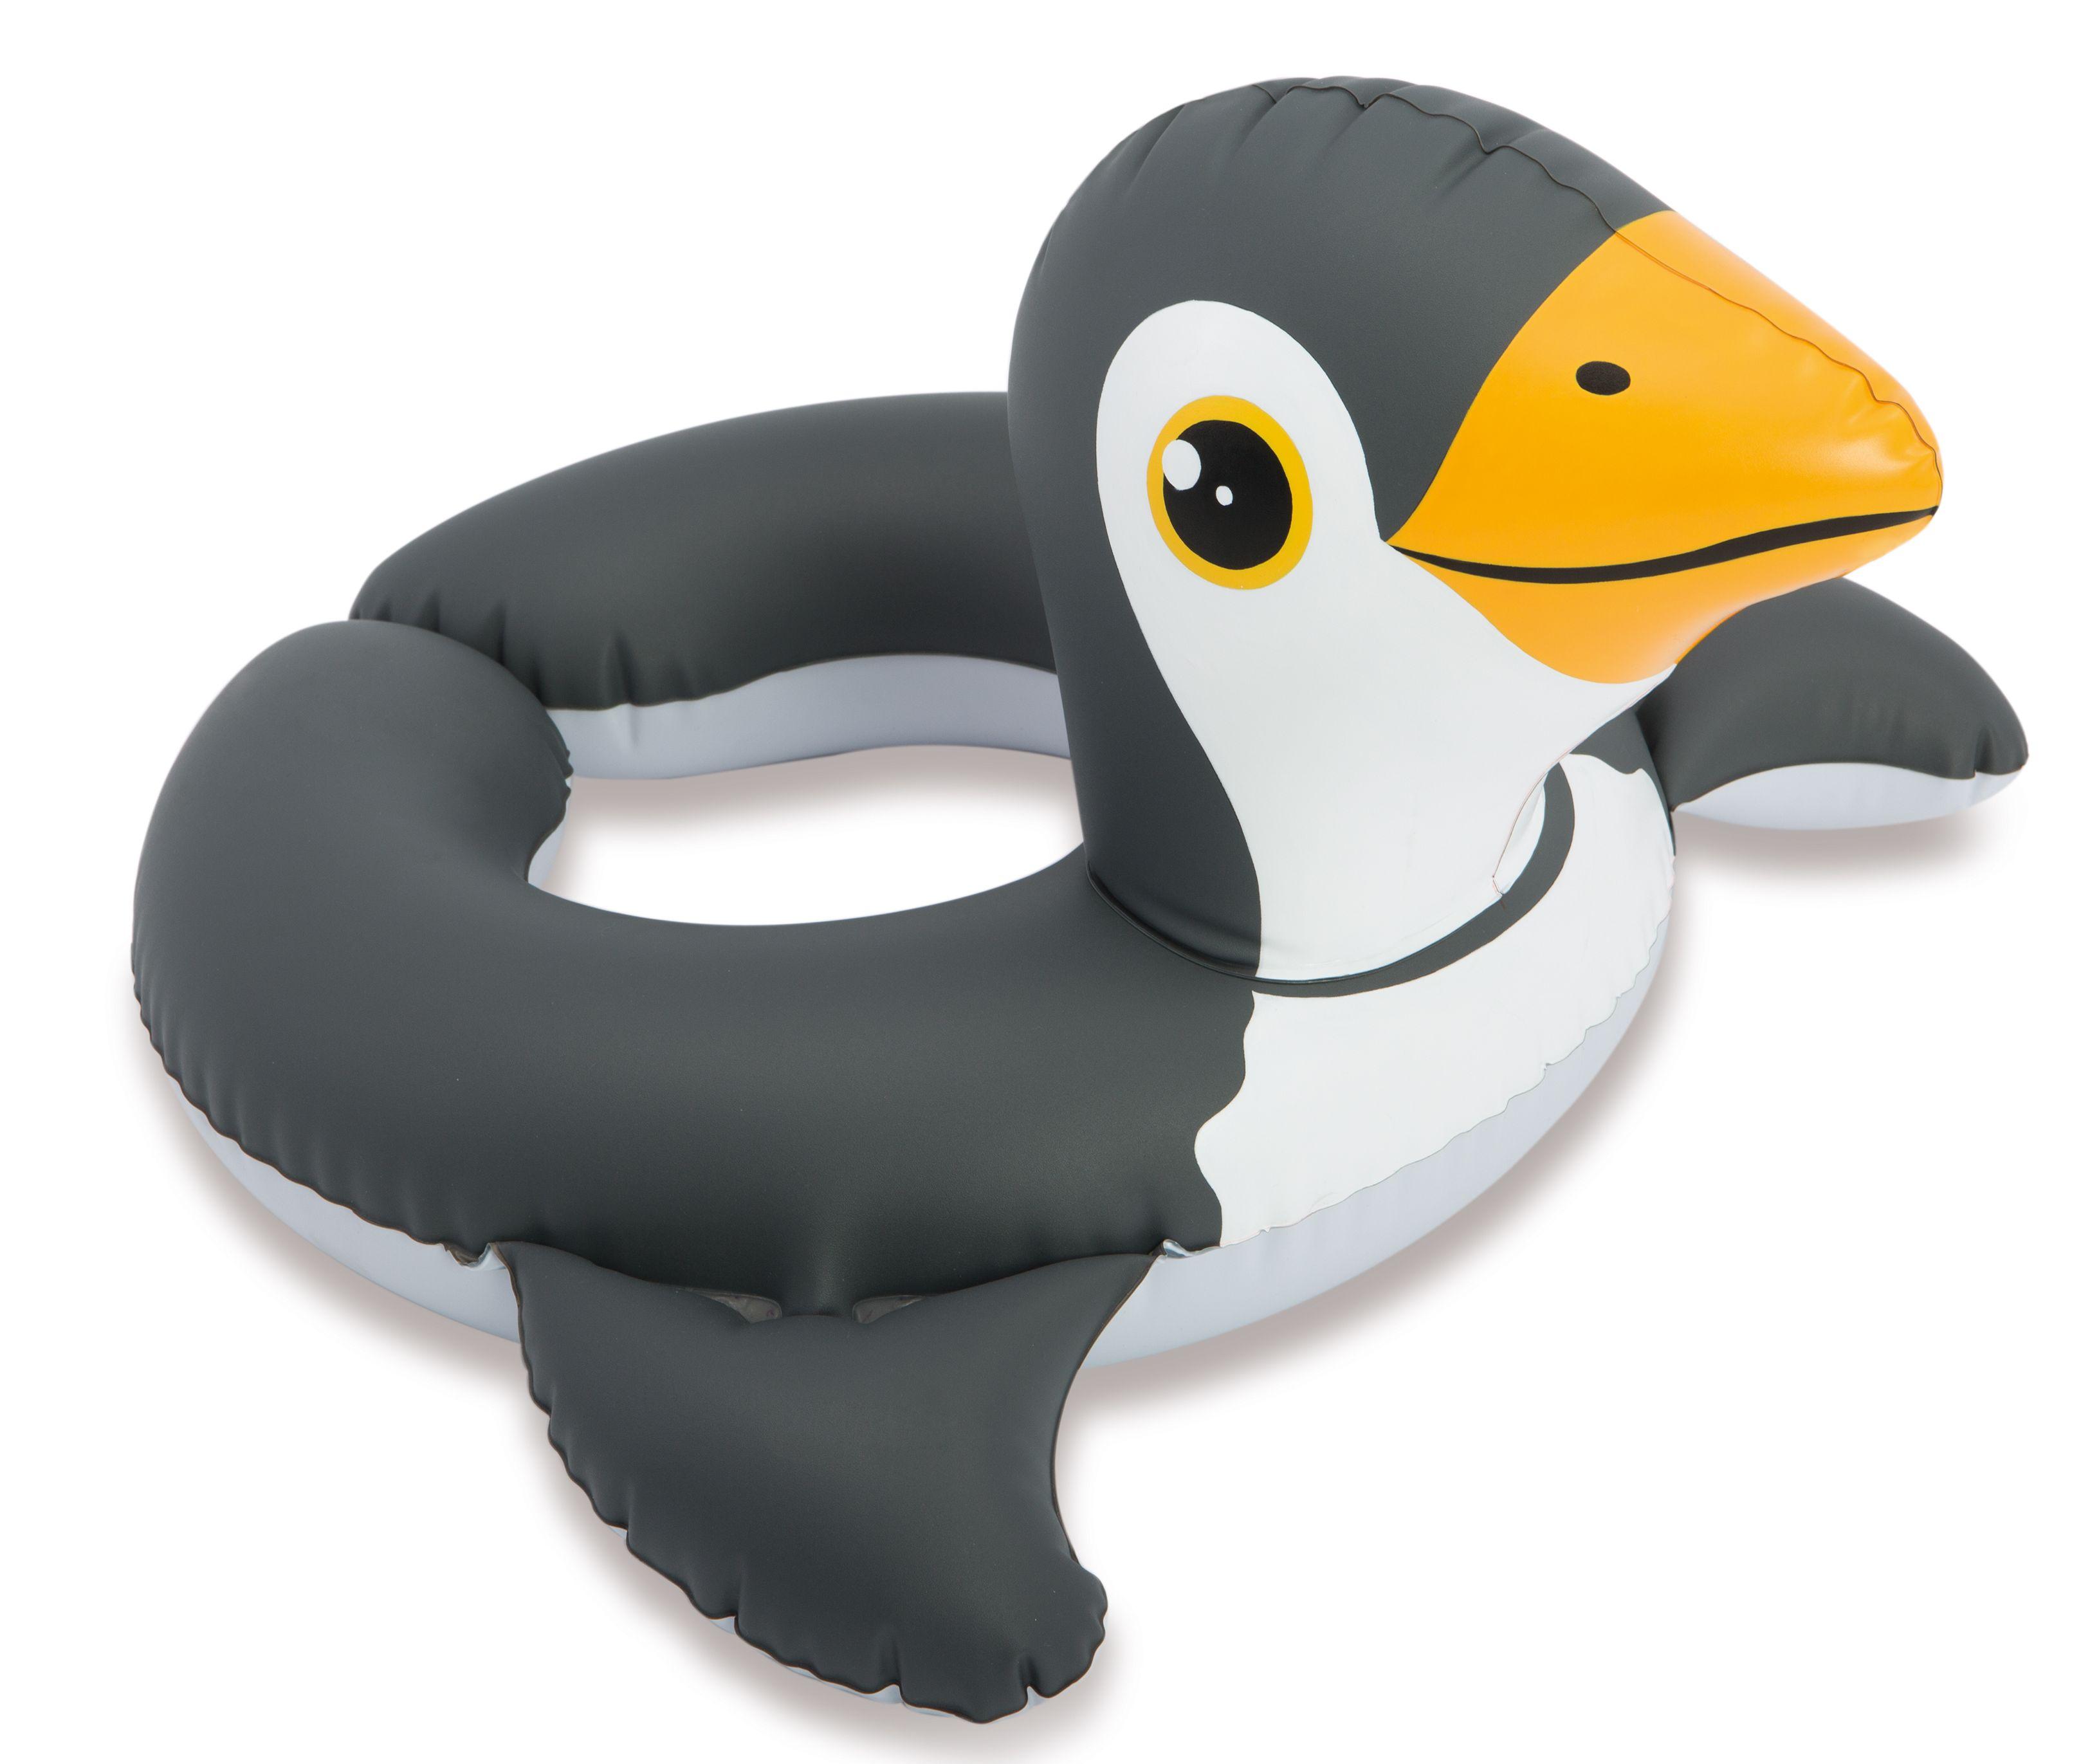 INTEX Plovací kruh tučňák 59220NP